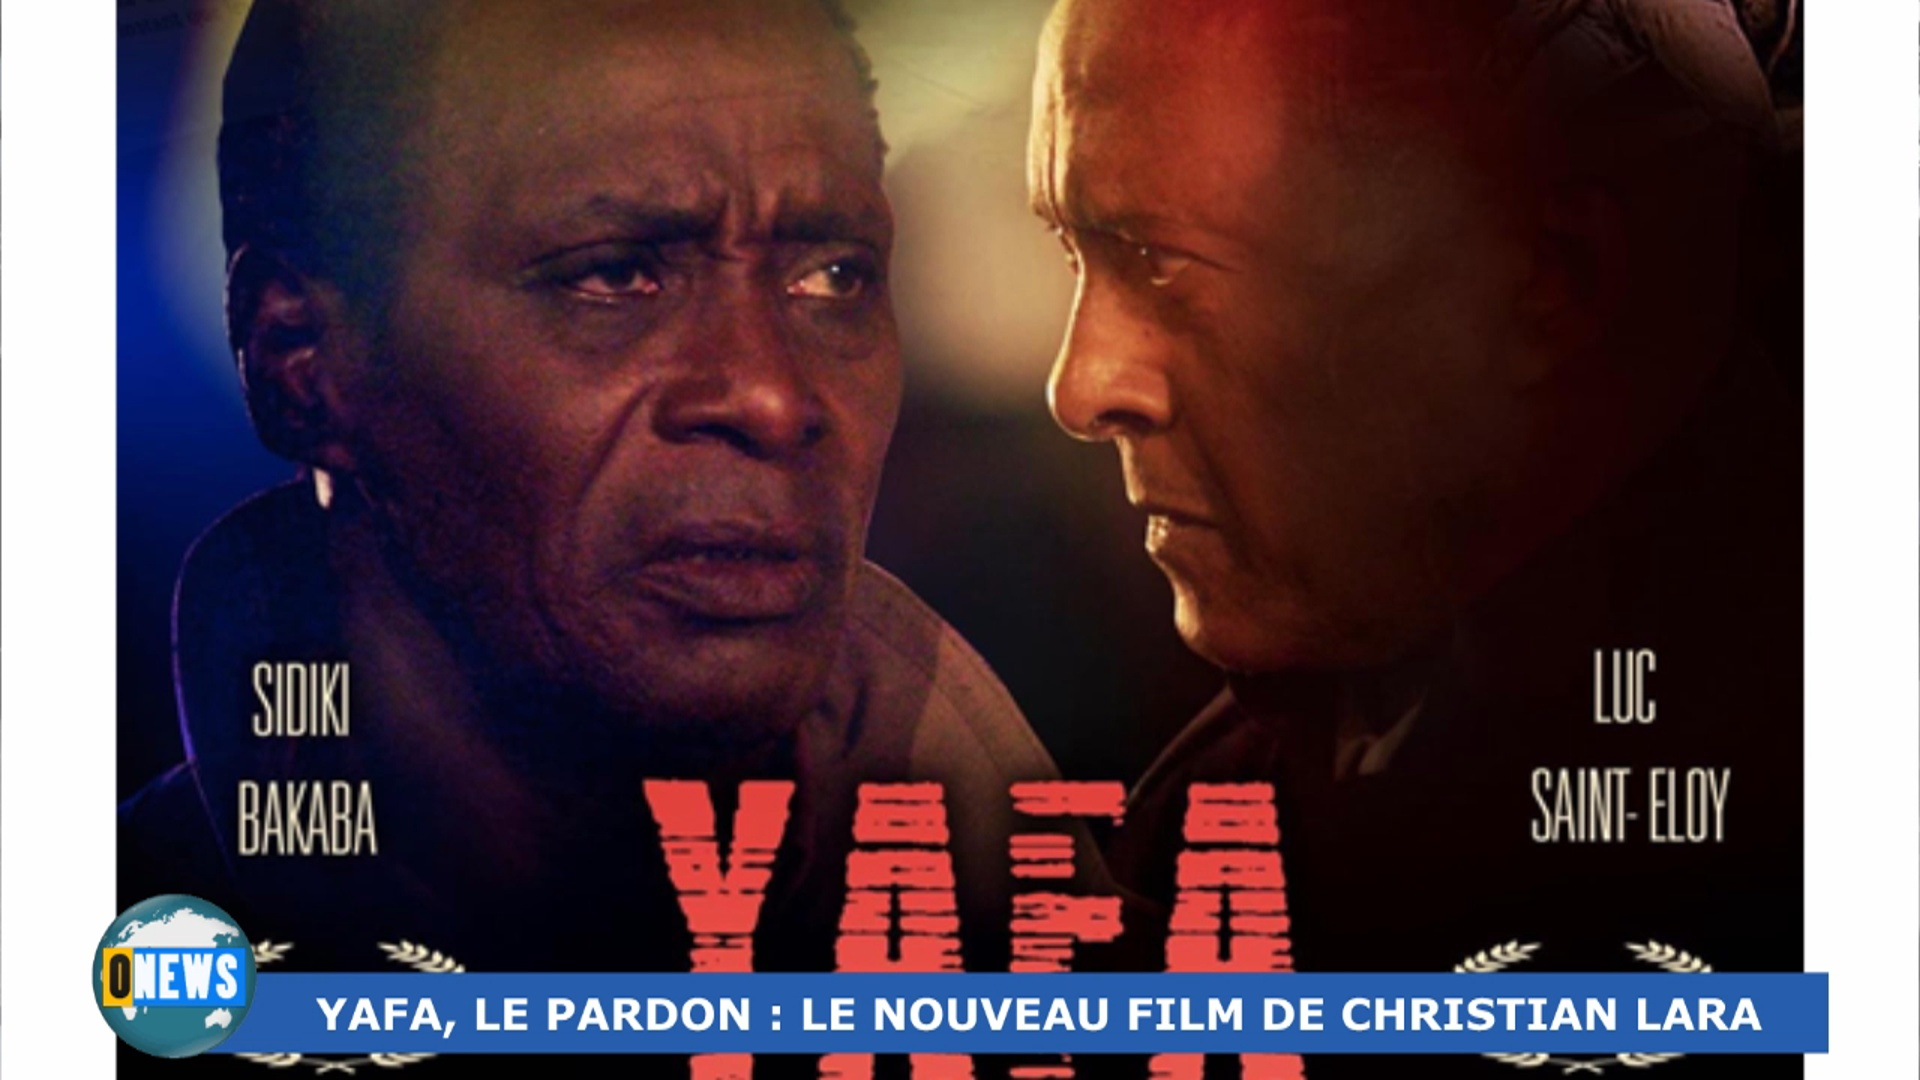 Onews . YAFA, le Pardon. Nouveau film de Christian LARA